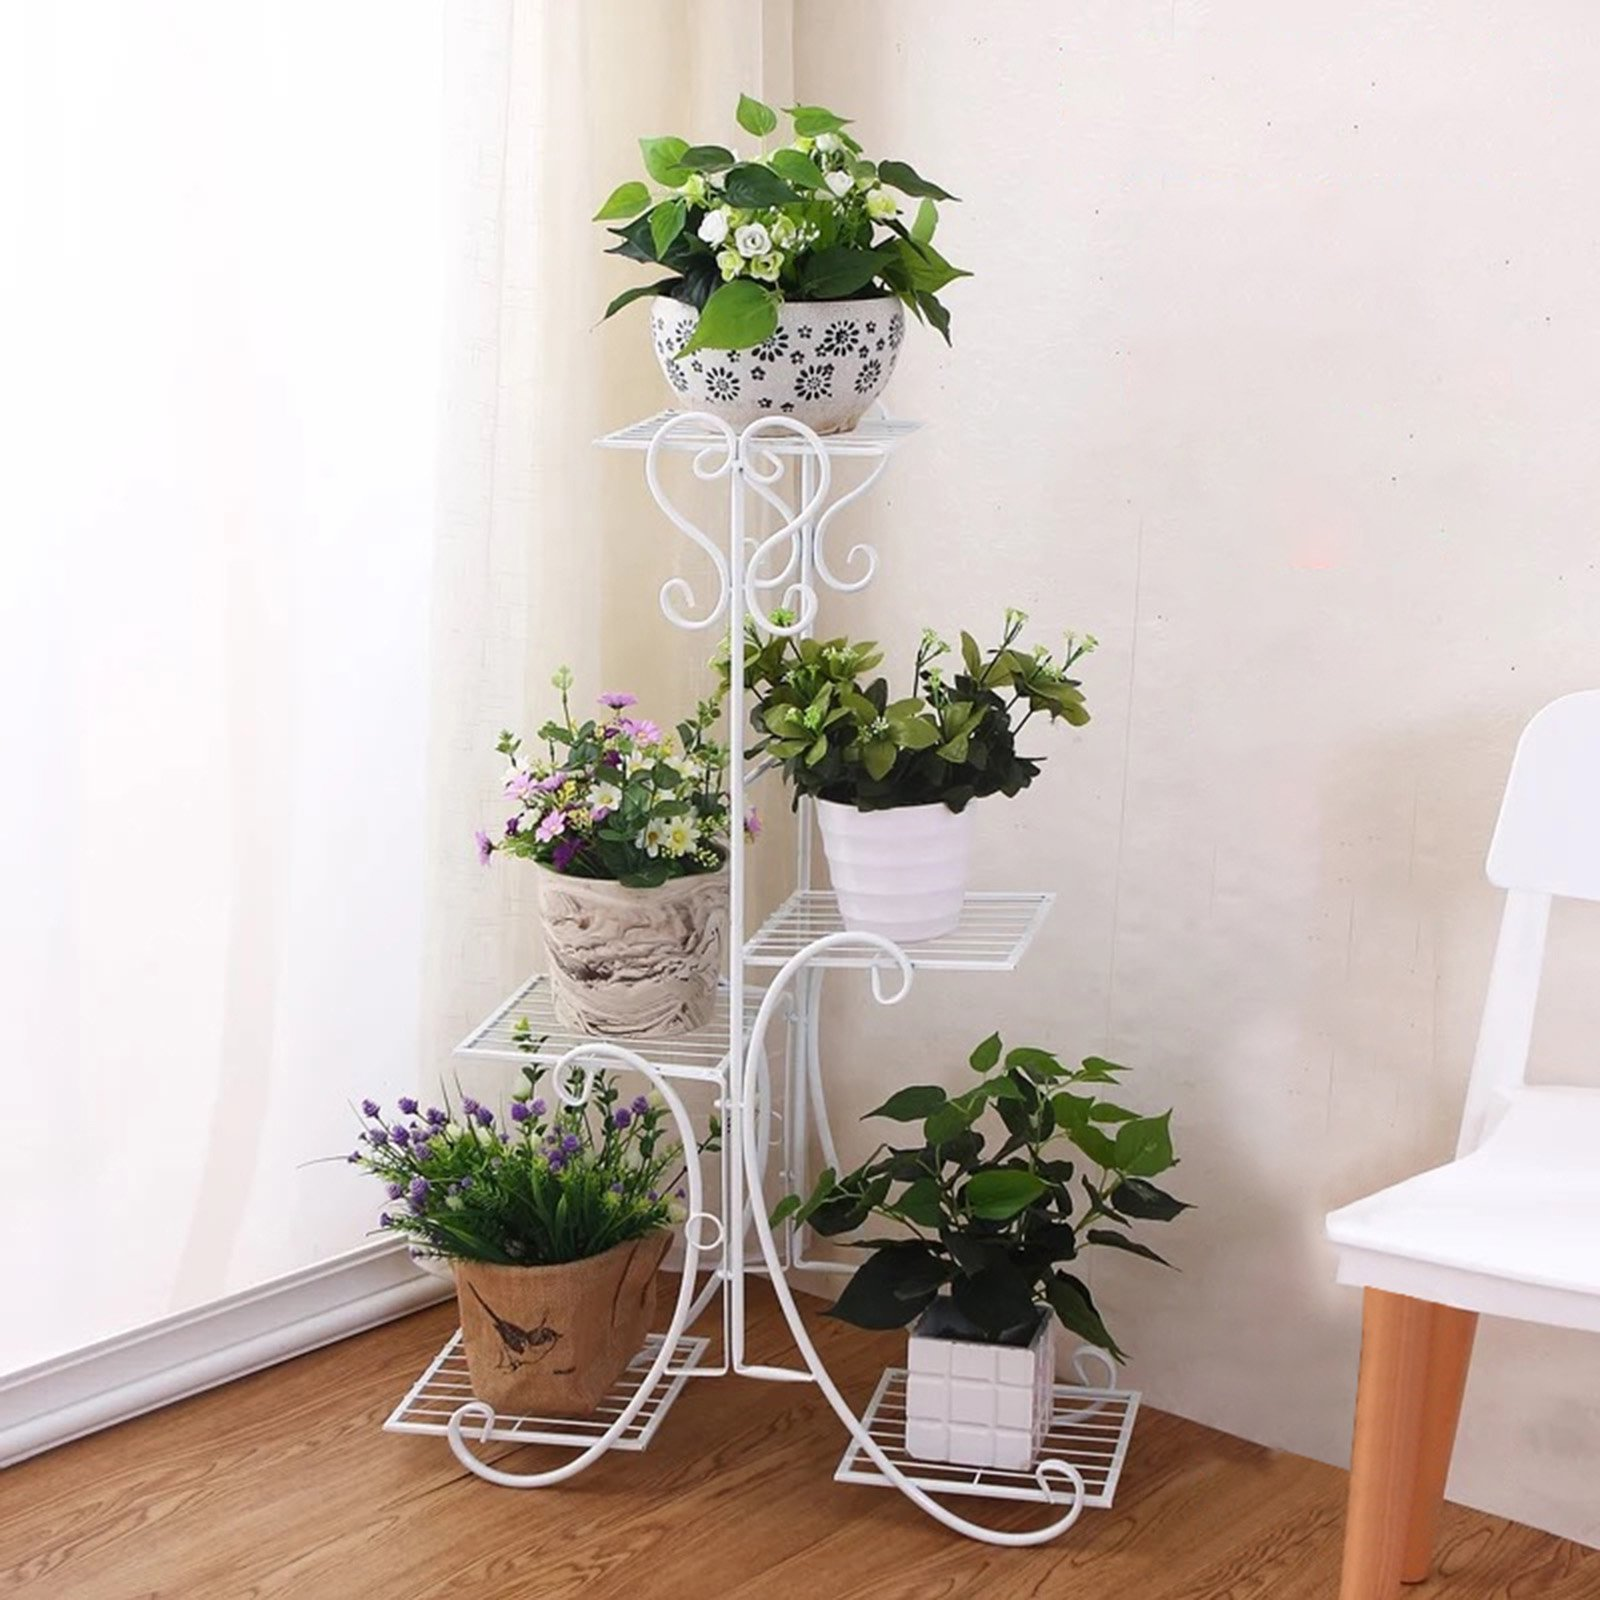 Solofish 5 Tier Metal Plant Stand Decorative Planter Holder Flower Pots Stander White